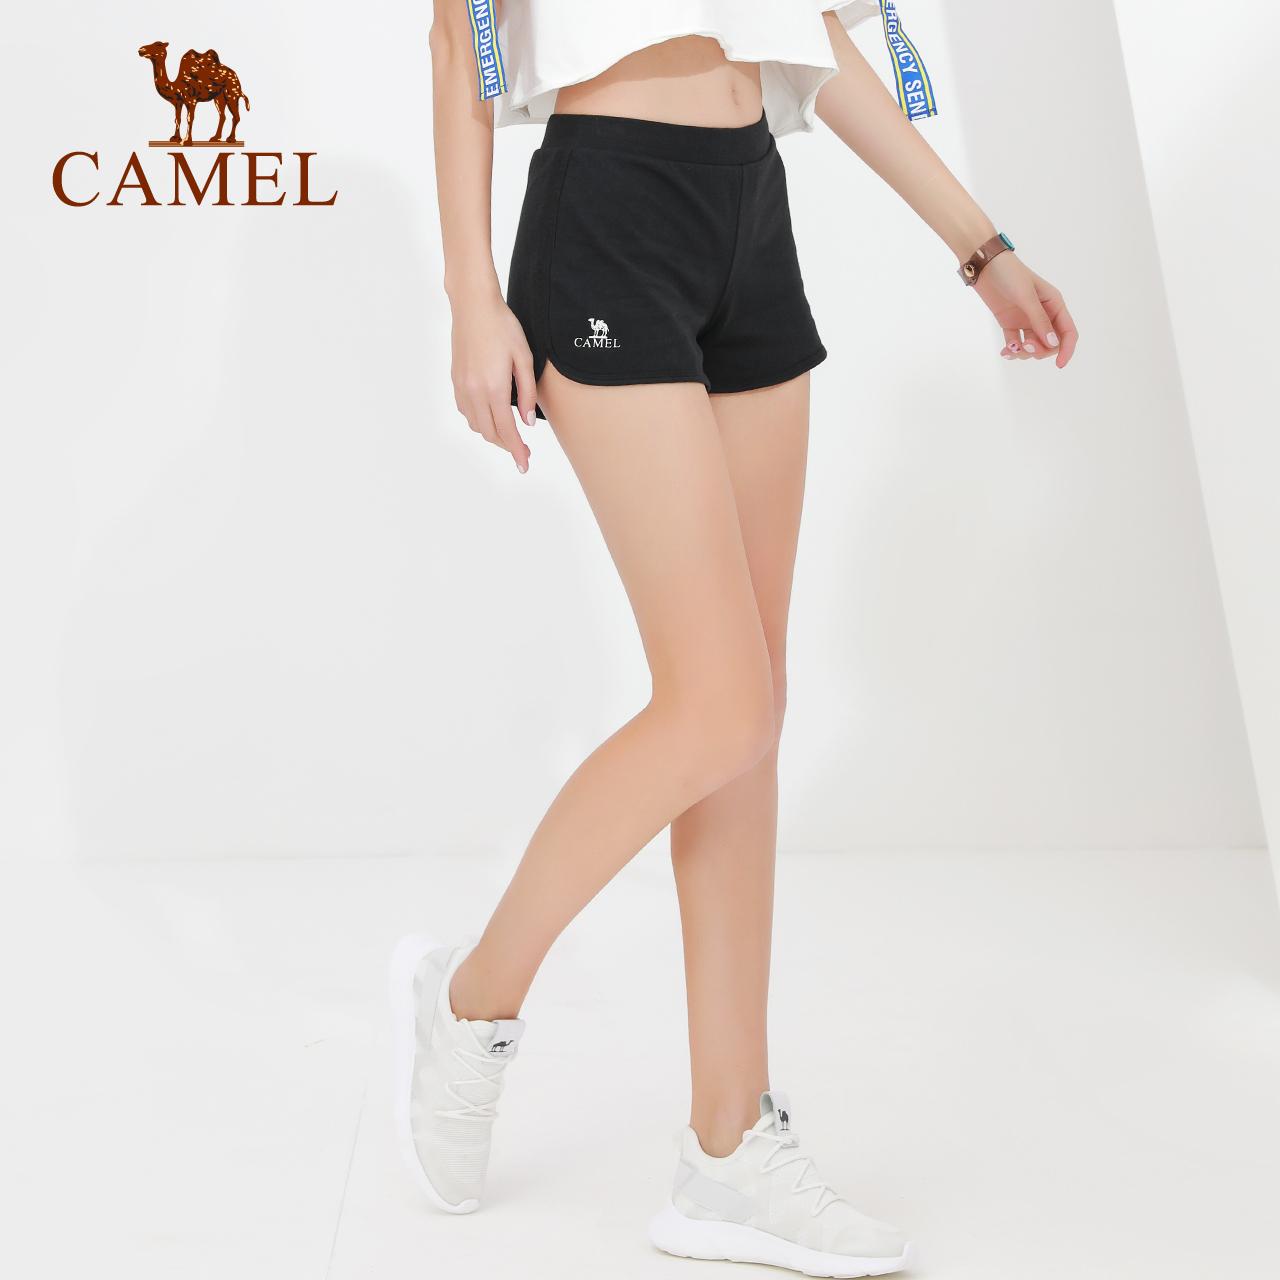 CAMEL 骆驼户外 Z9S206116 男士宽松五分裤 *2件 66.3元(合33.15元/件)